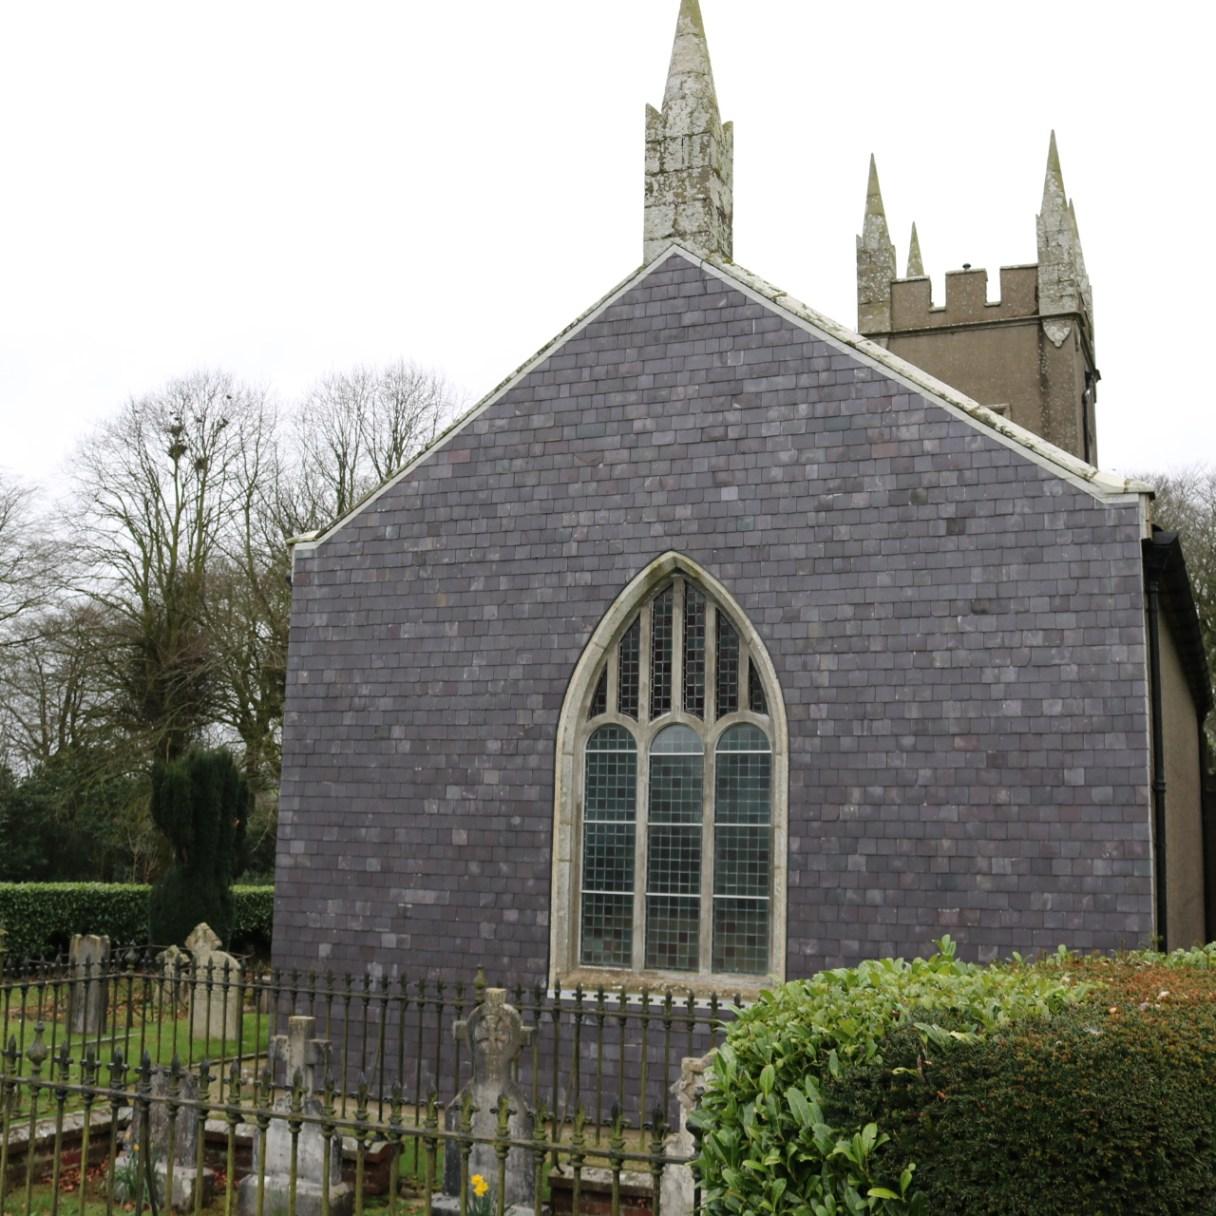 Clonmore Church of Ireland Bree 2017-03-10 15.01.48 (7)